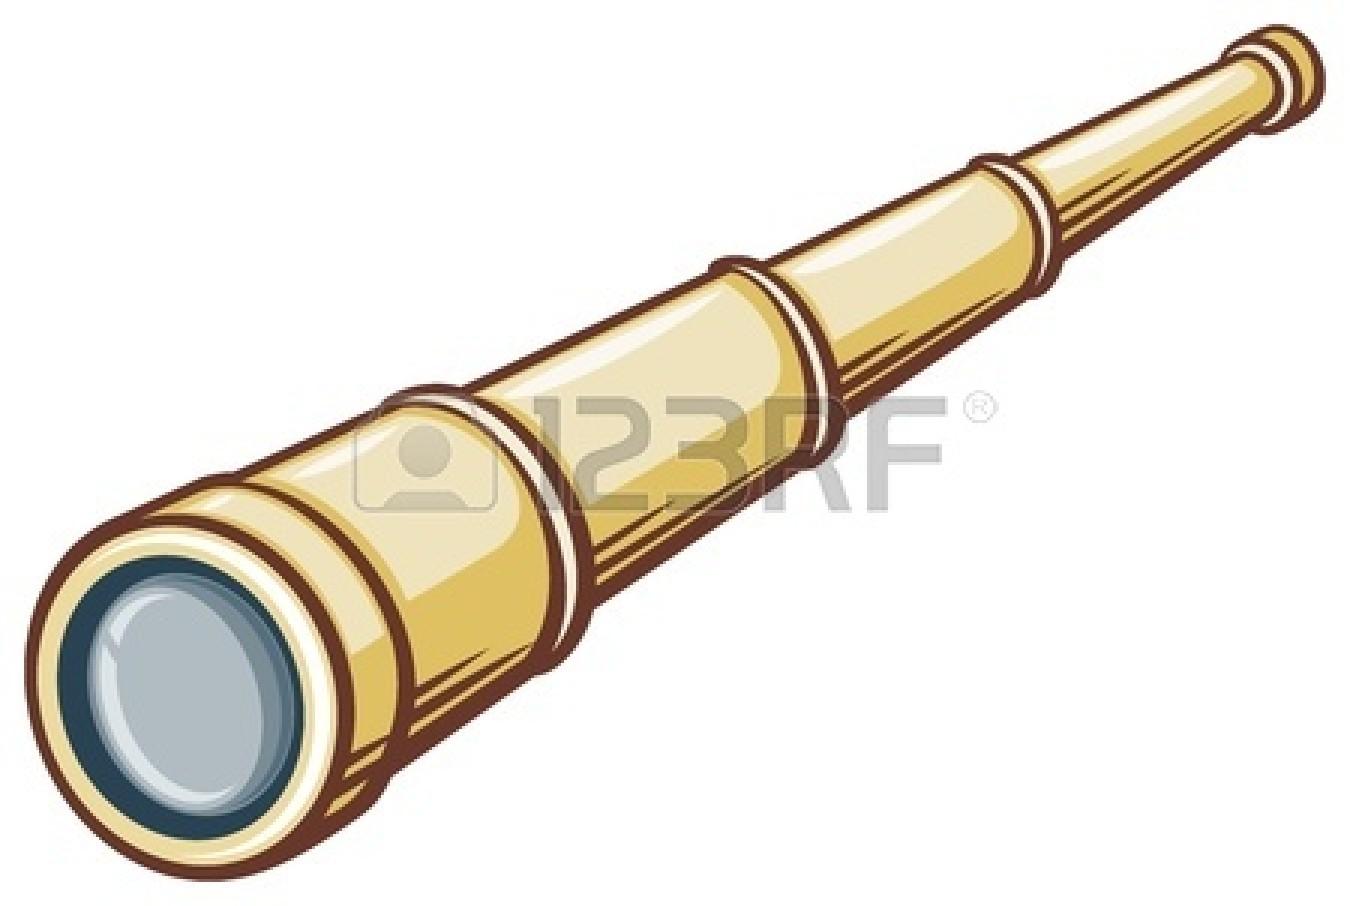 pirate telescope clipart clipart panda free clipart images rh clipartpanda com Pirate Hook Clip Art Walk the Plank Clip Art